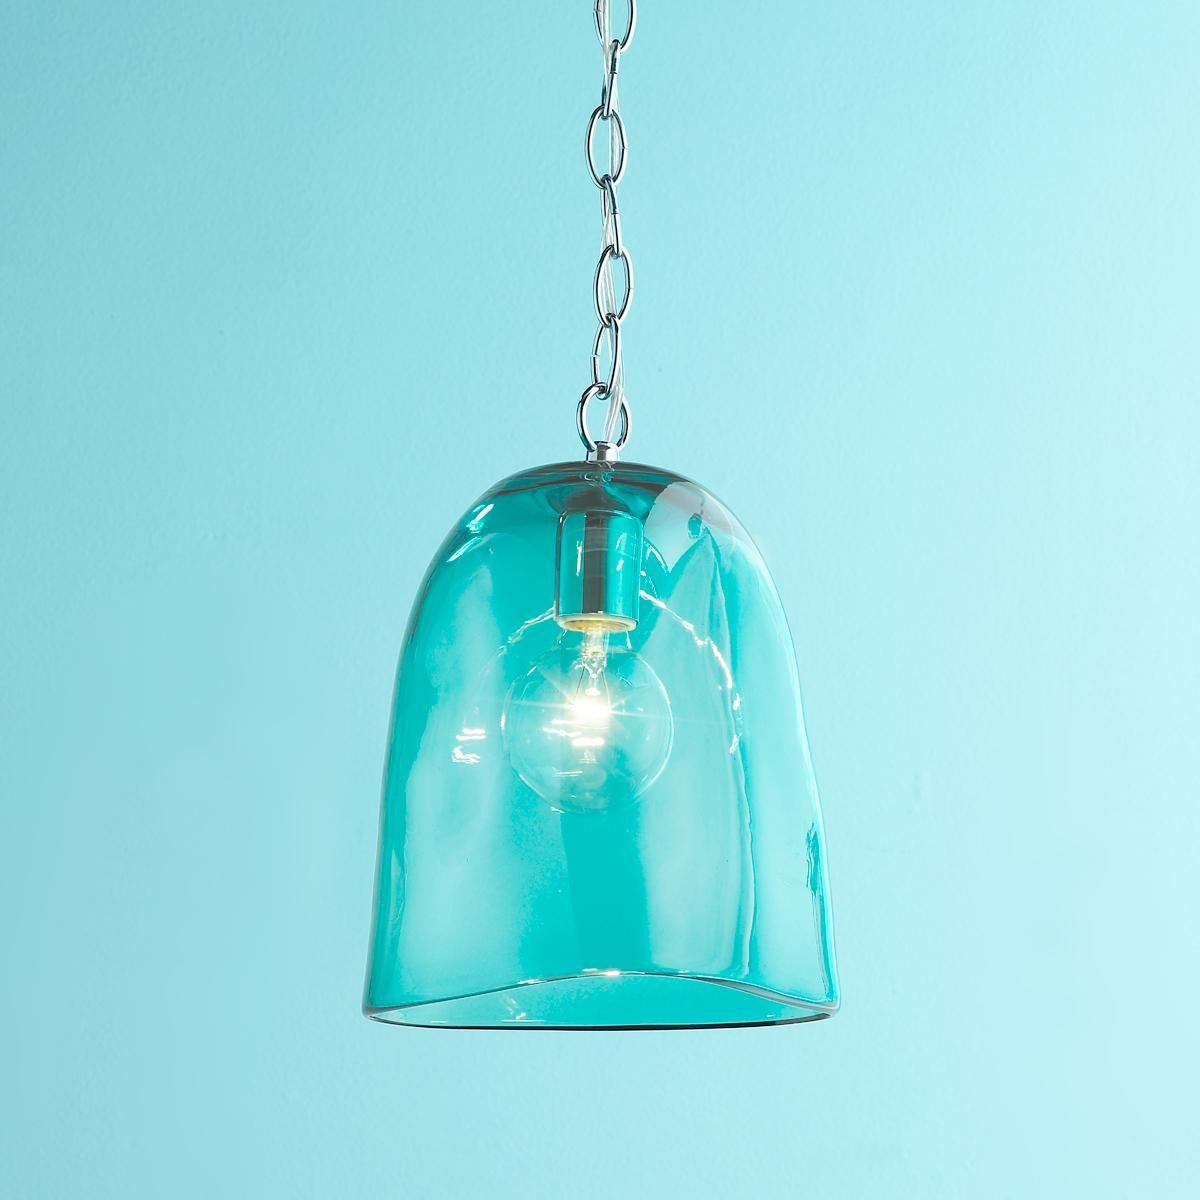 turquoise pendant lighting. Triangle Glass Pendant Light $129.00 At Shades Of Turquoise Lighting T